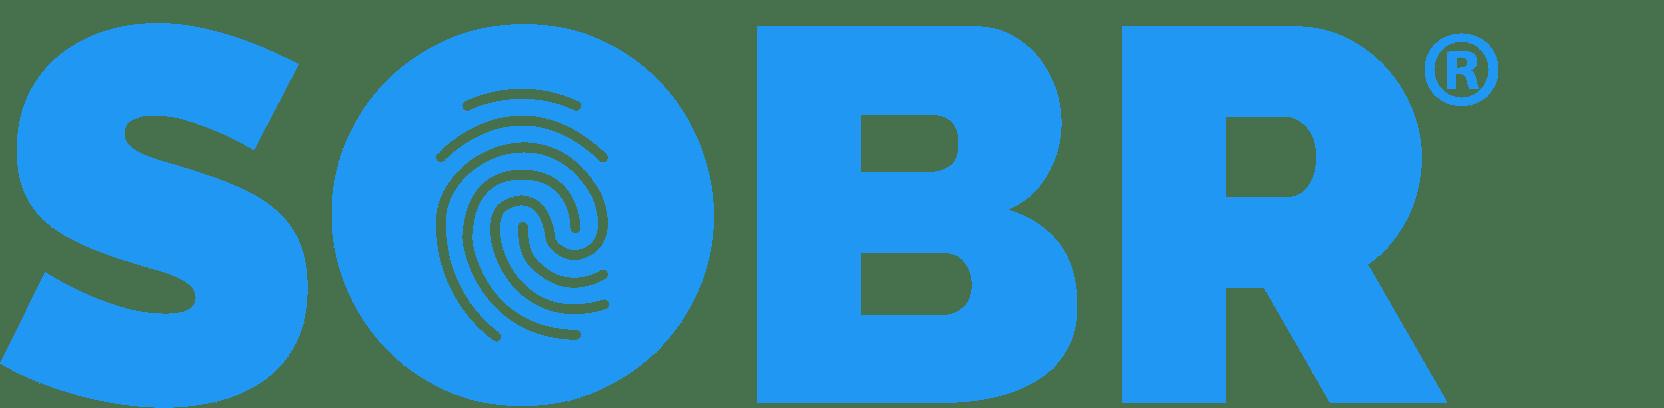 SOBR®